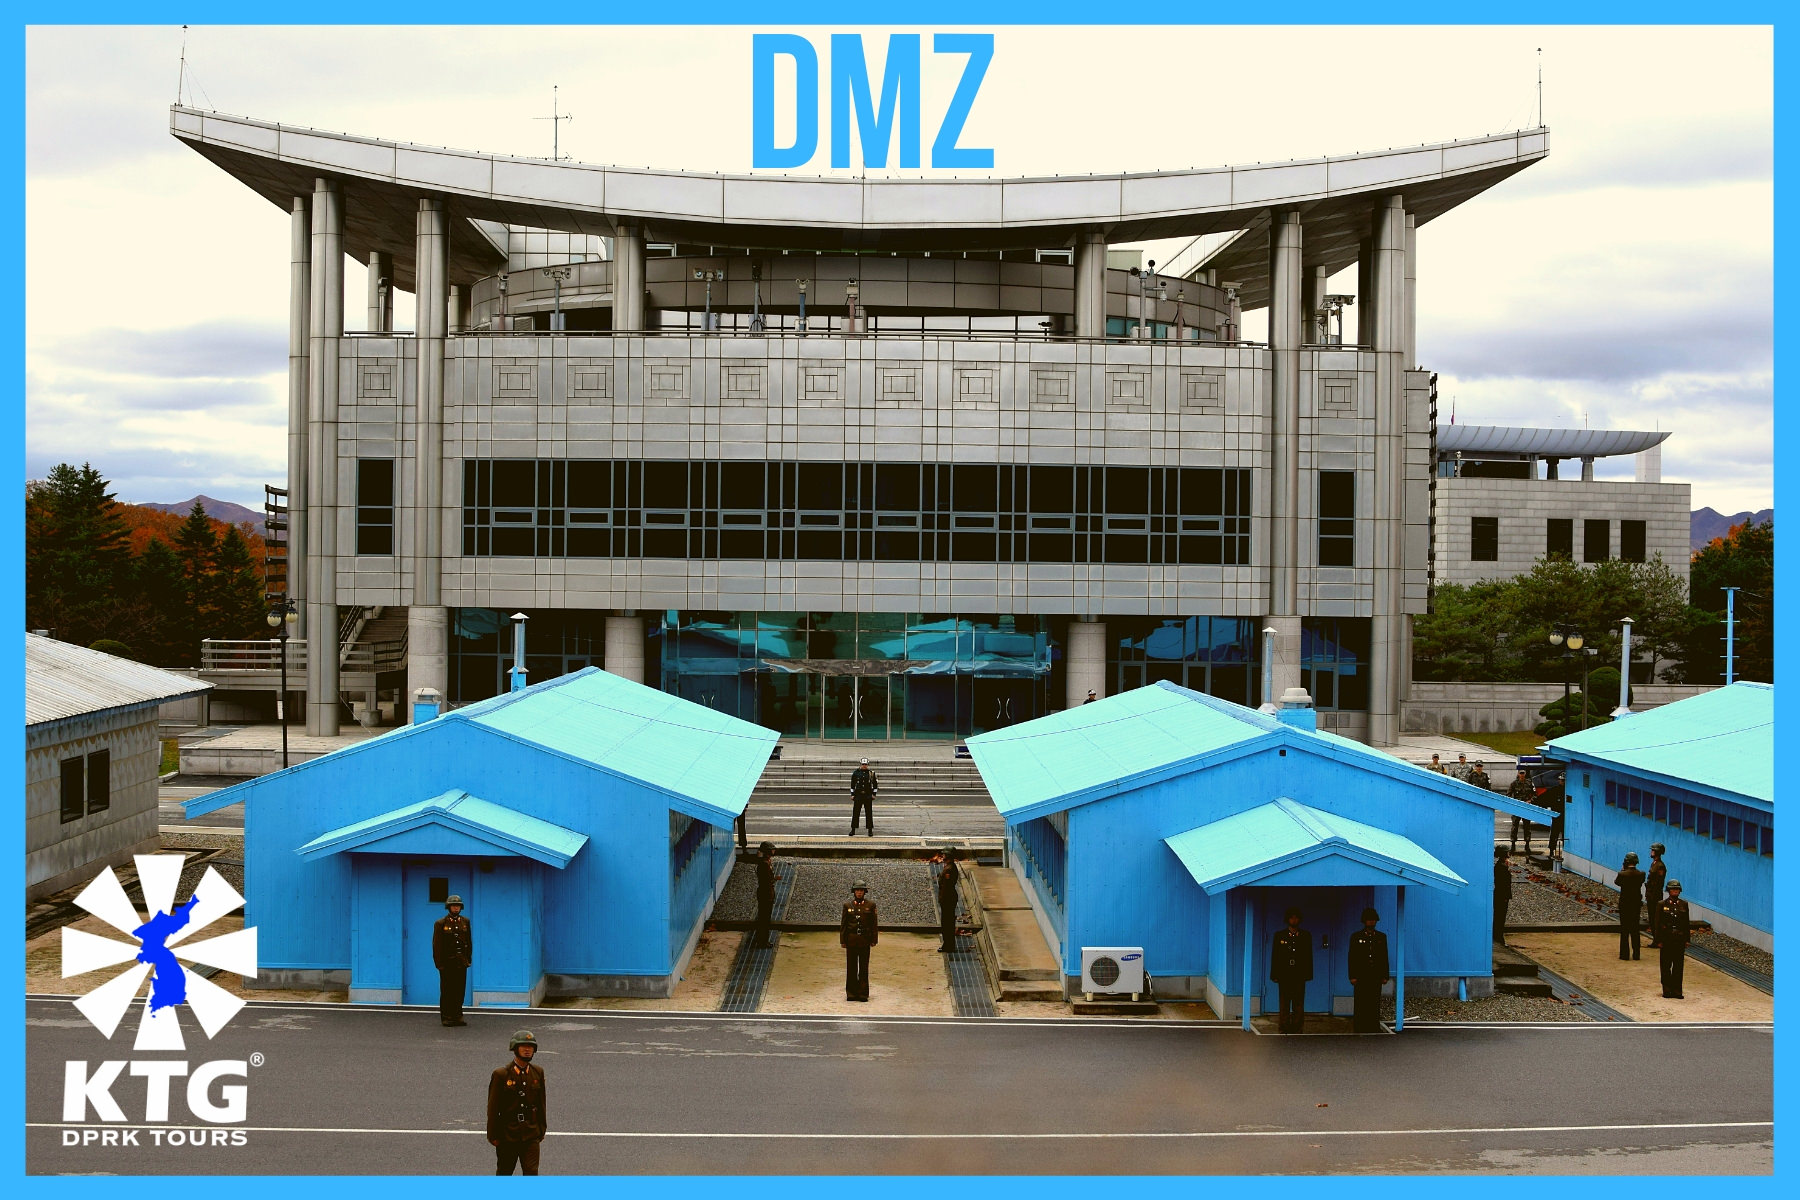 DMZ negotiation rooms in North Korea and South Korea, Panmunjom